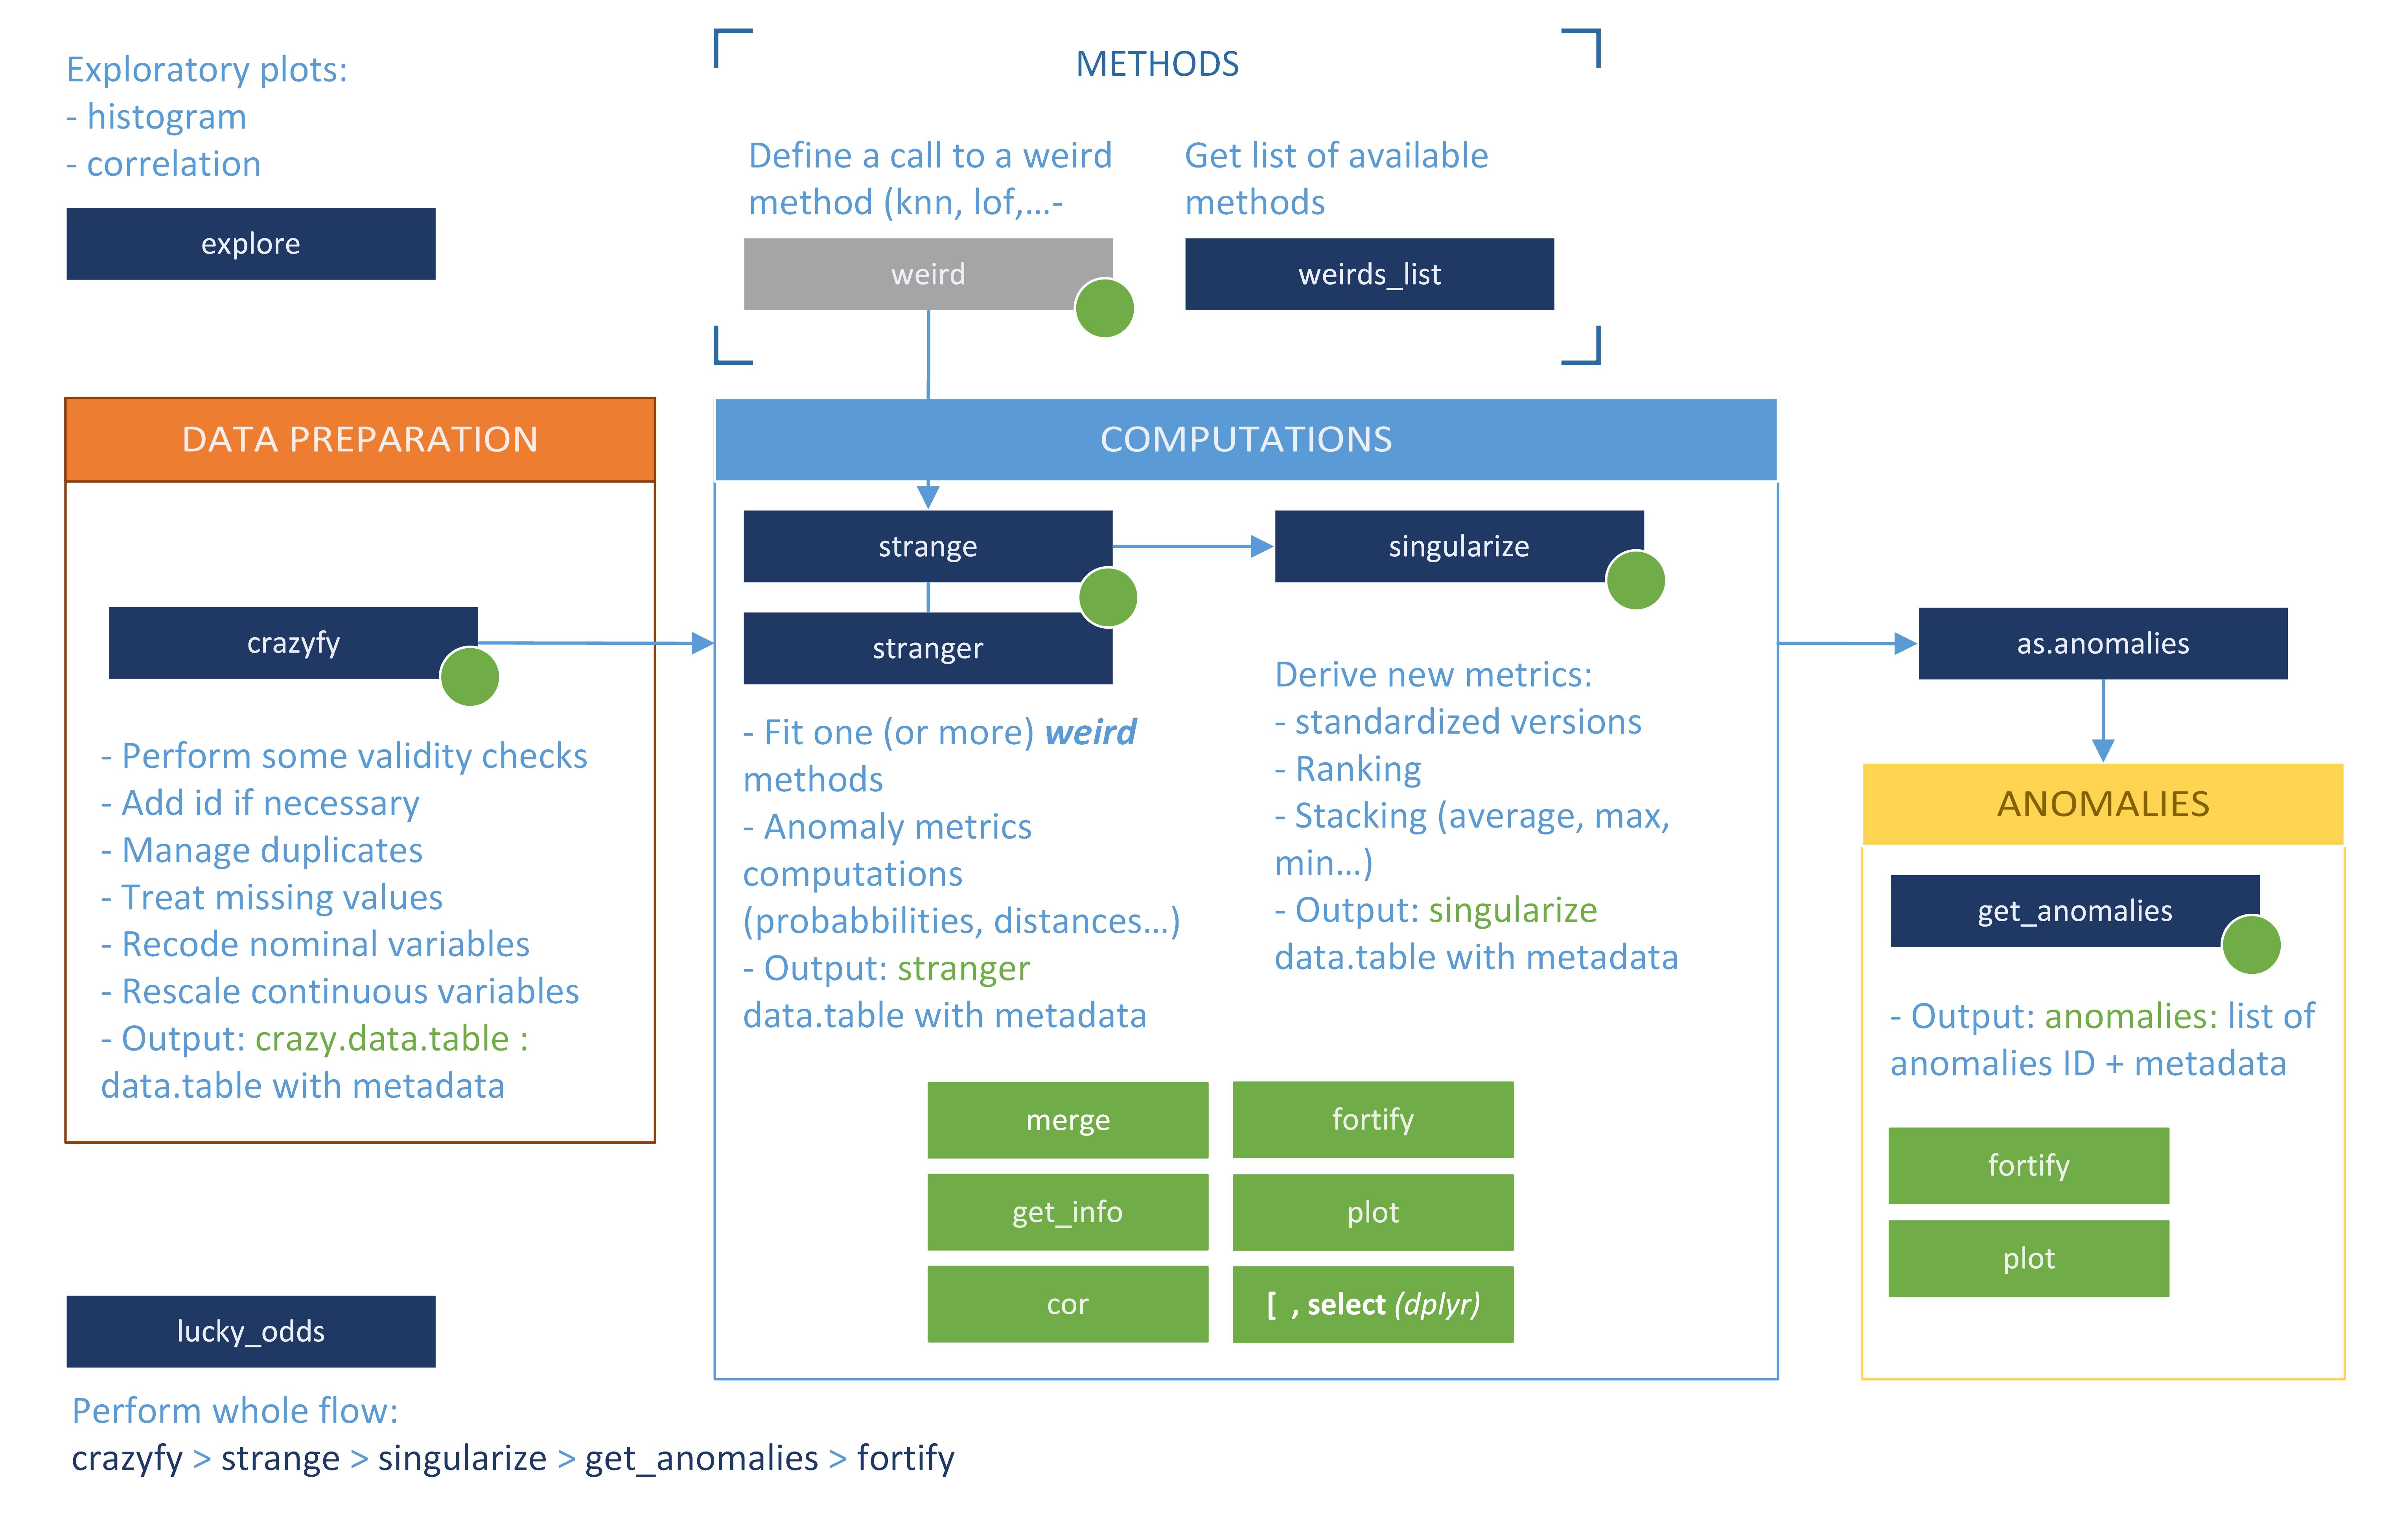 Analysis workflow